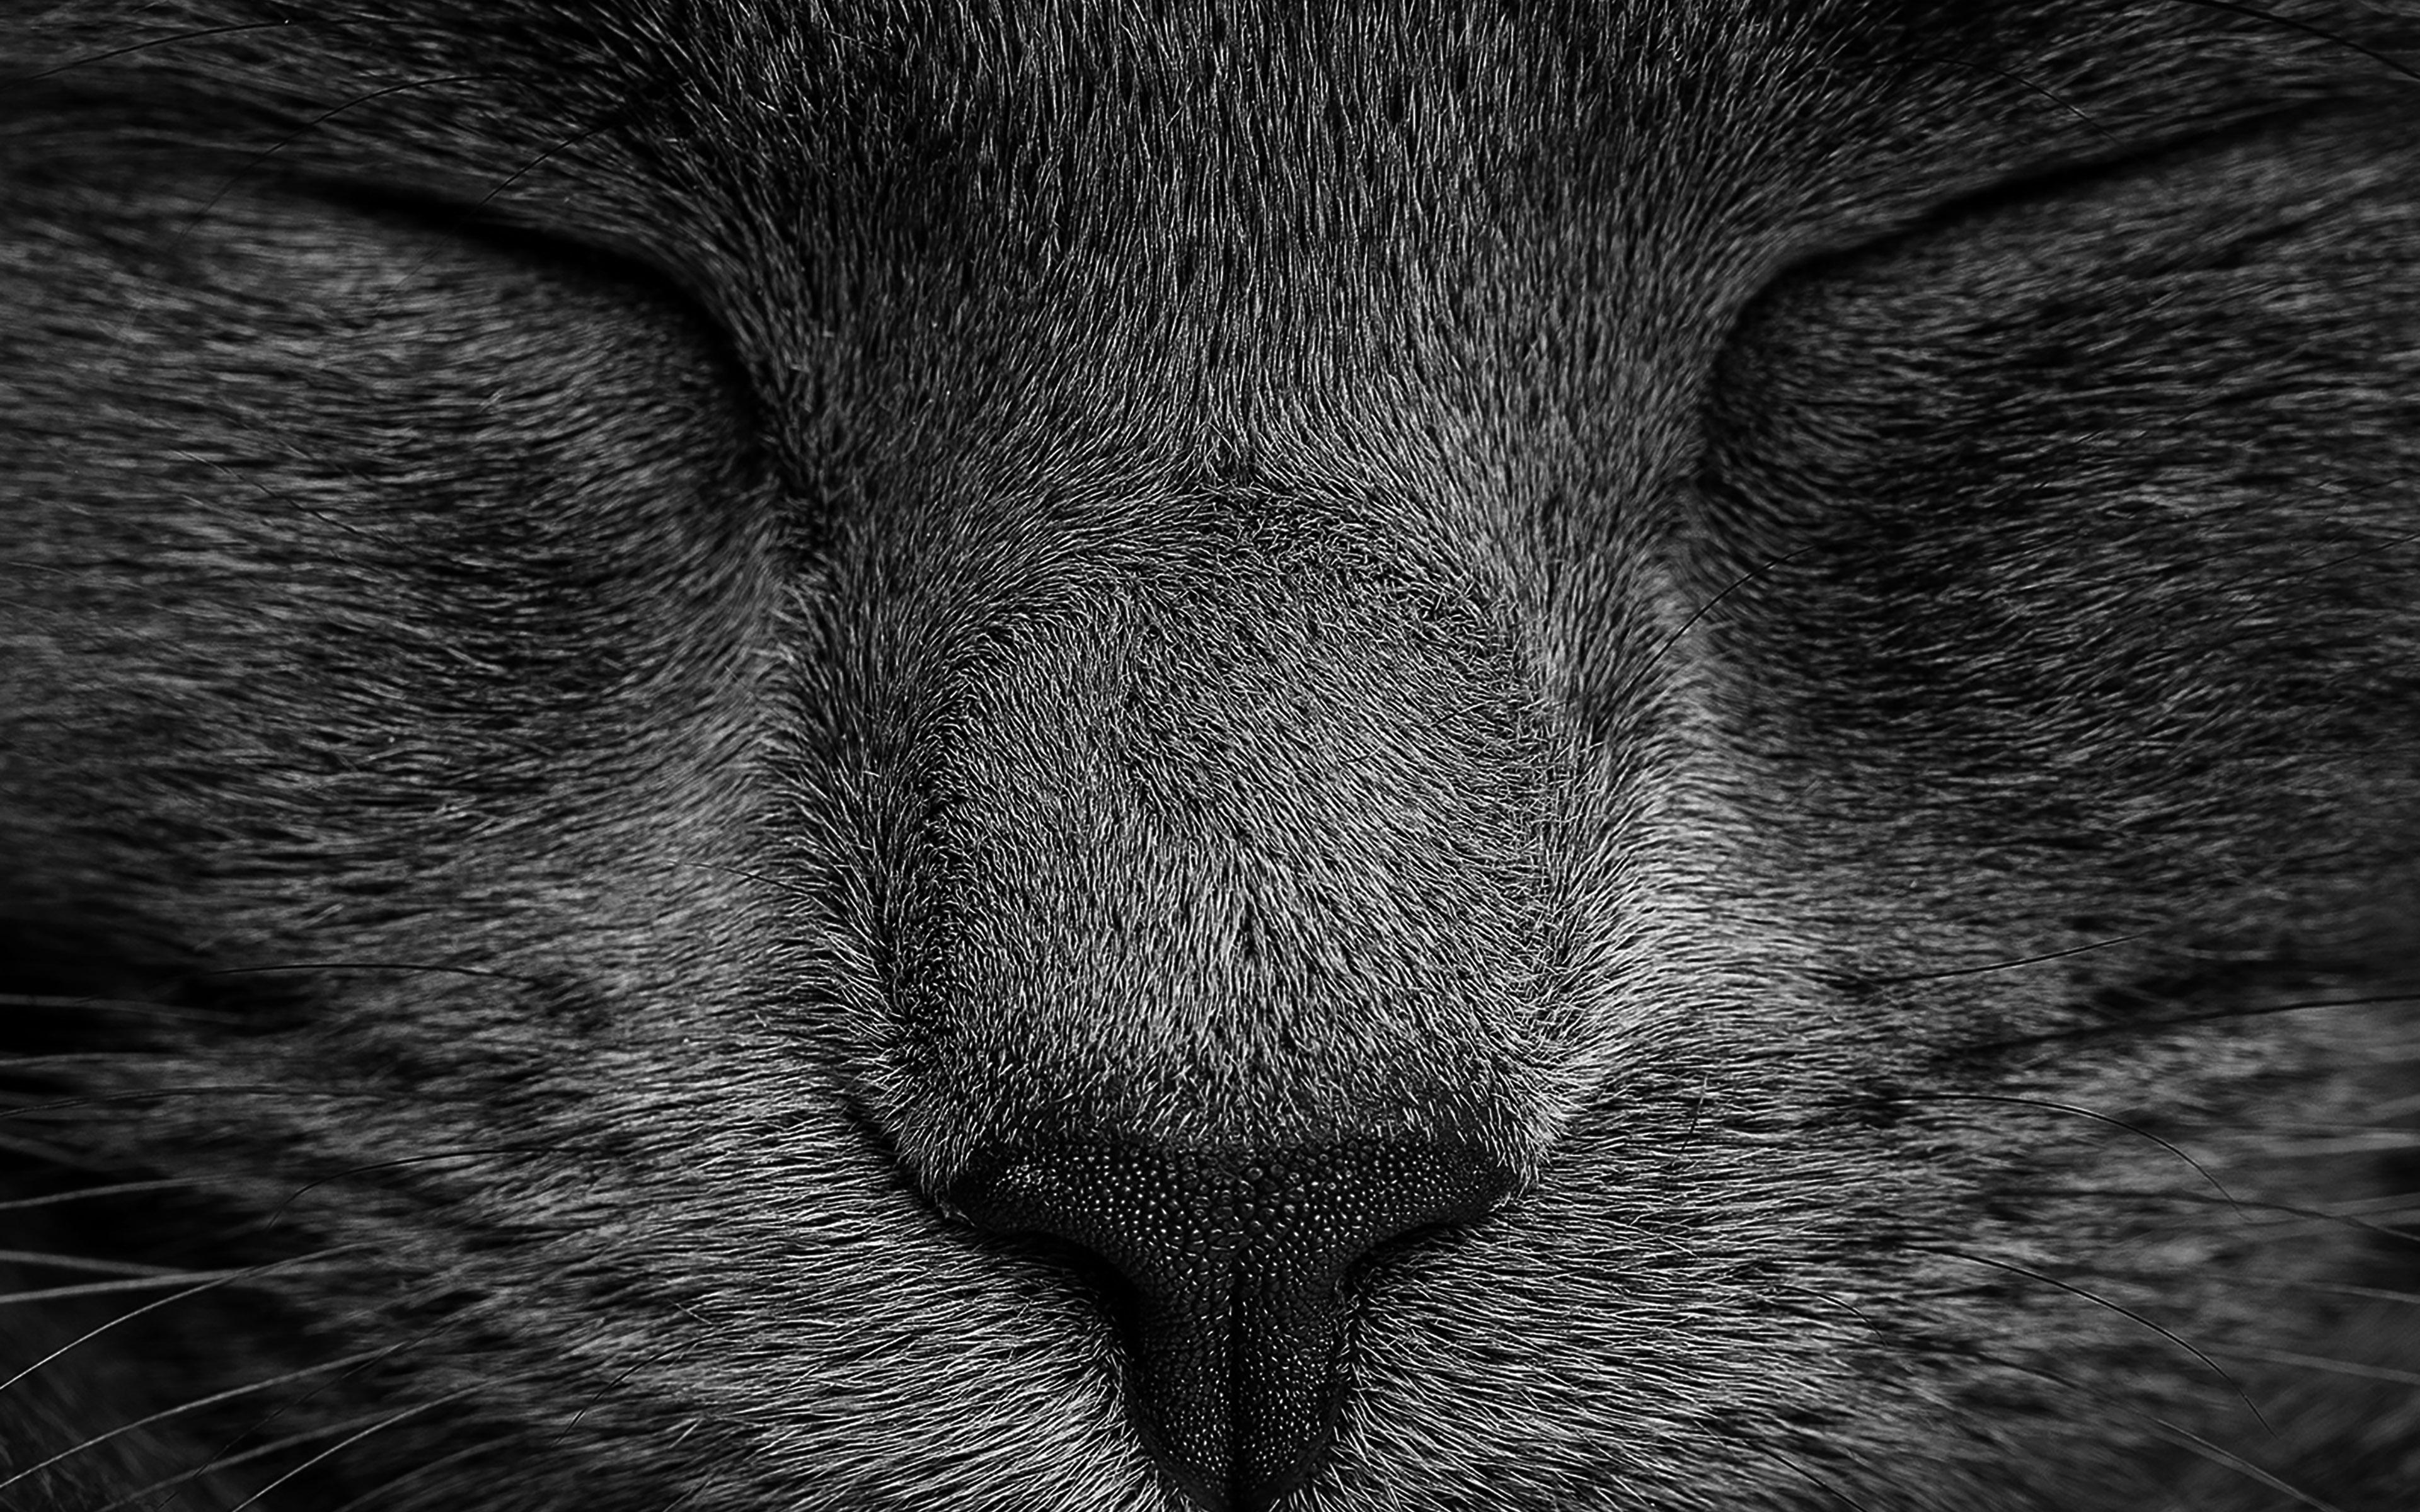 Ae80 Sleeping Black Cat Zoom Nature Wallpaper